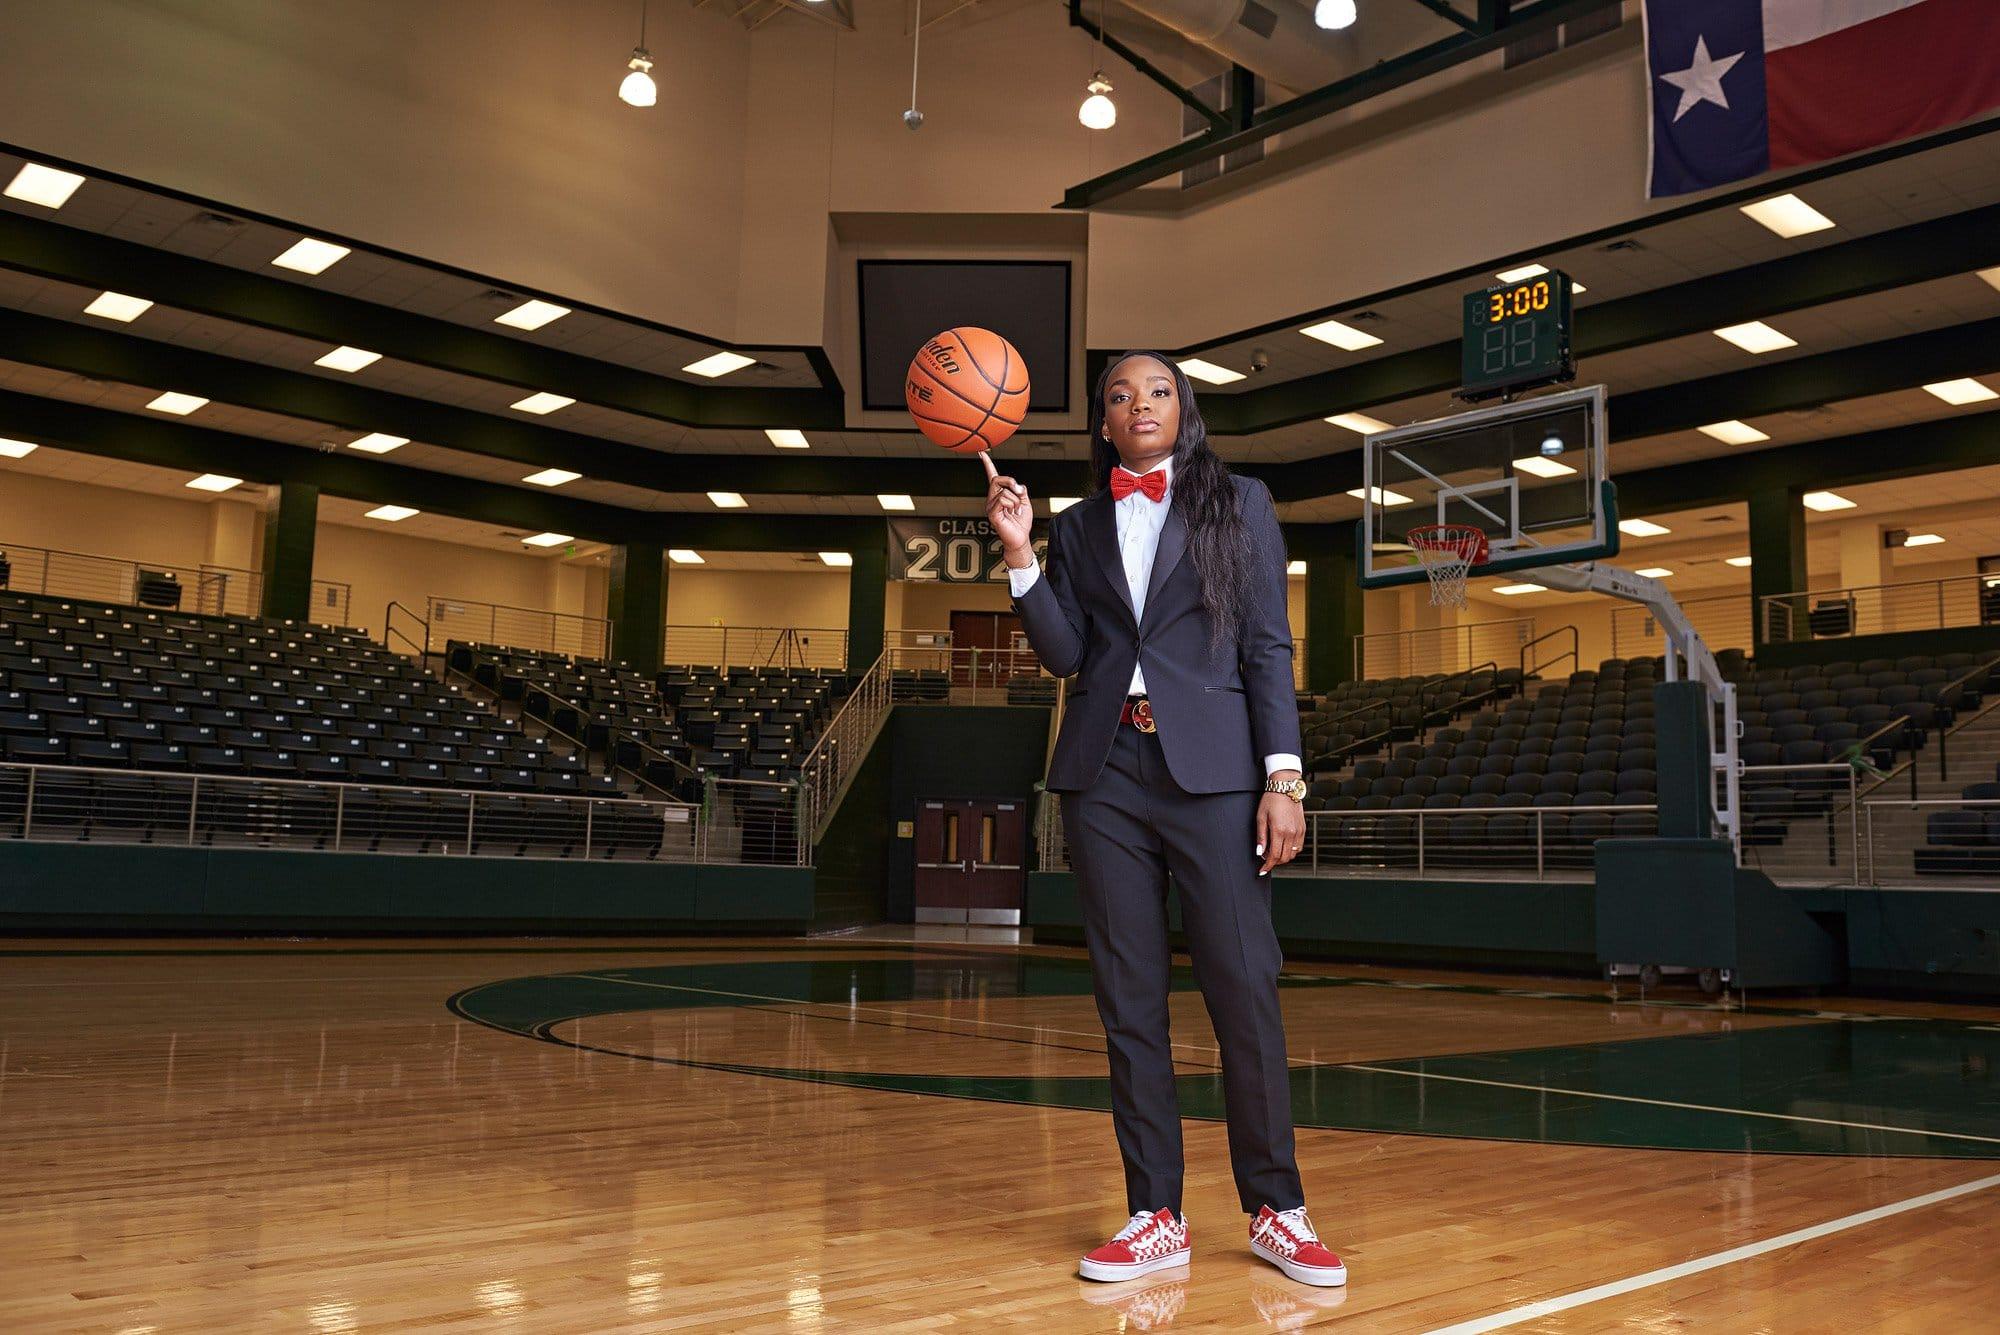 Mckinney photographer photographs Jordyn Oliver from Prosper High School fashion sports portraits